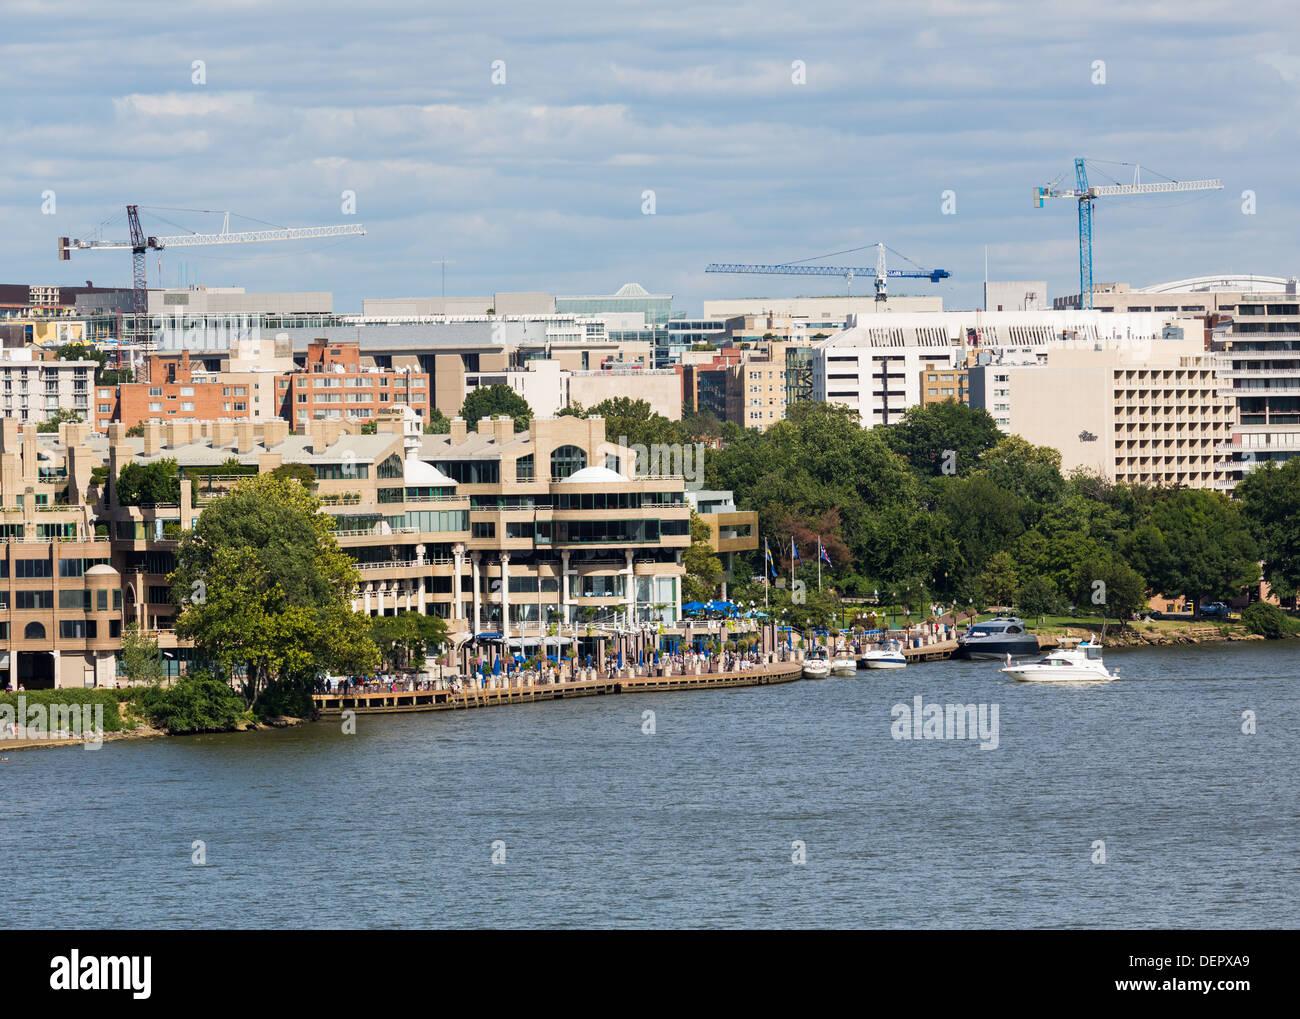 Washington DC Harbor and waterside on the Potomac River, USA - Stock Image